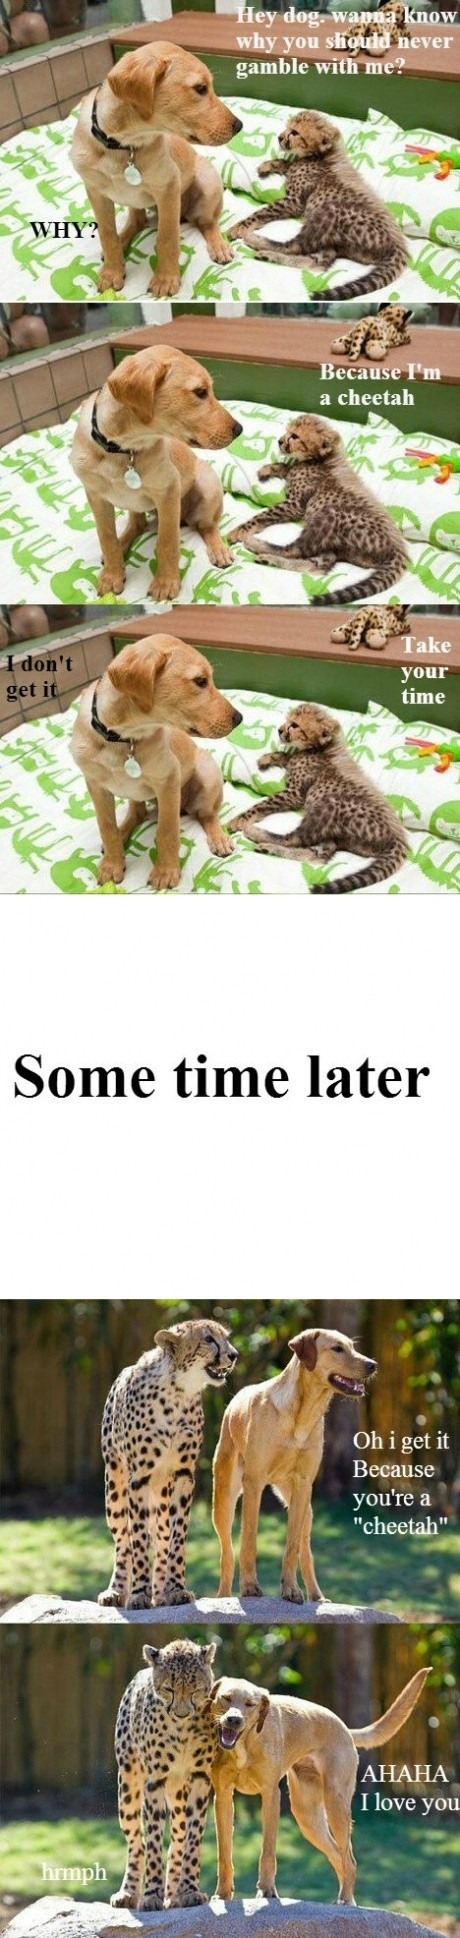 Funny cheetah